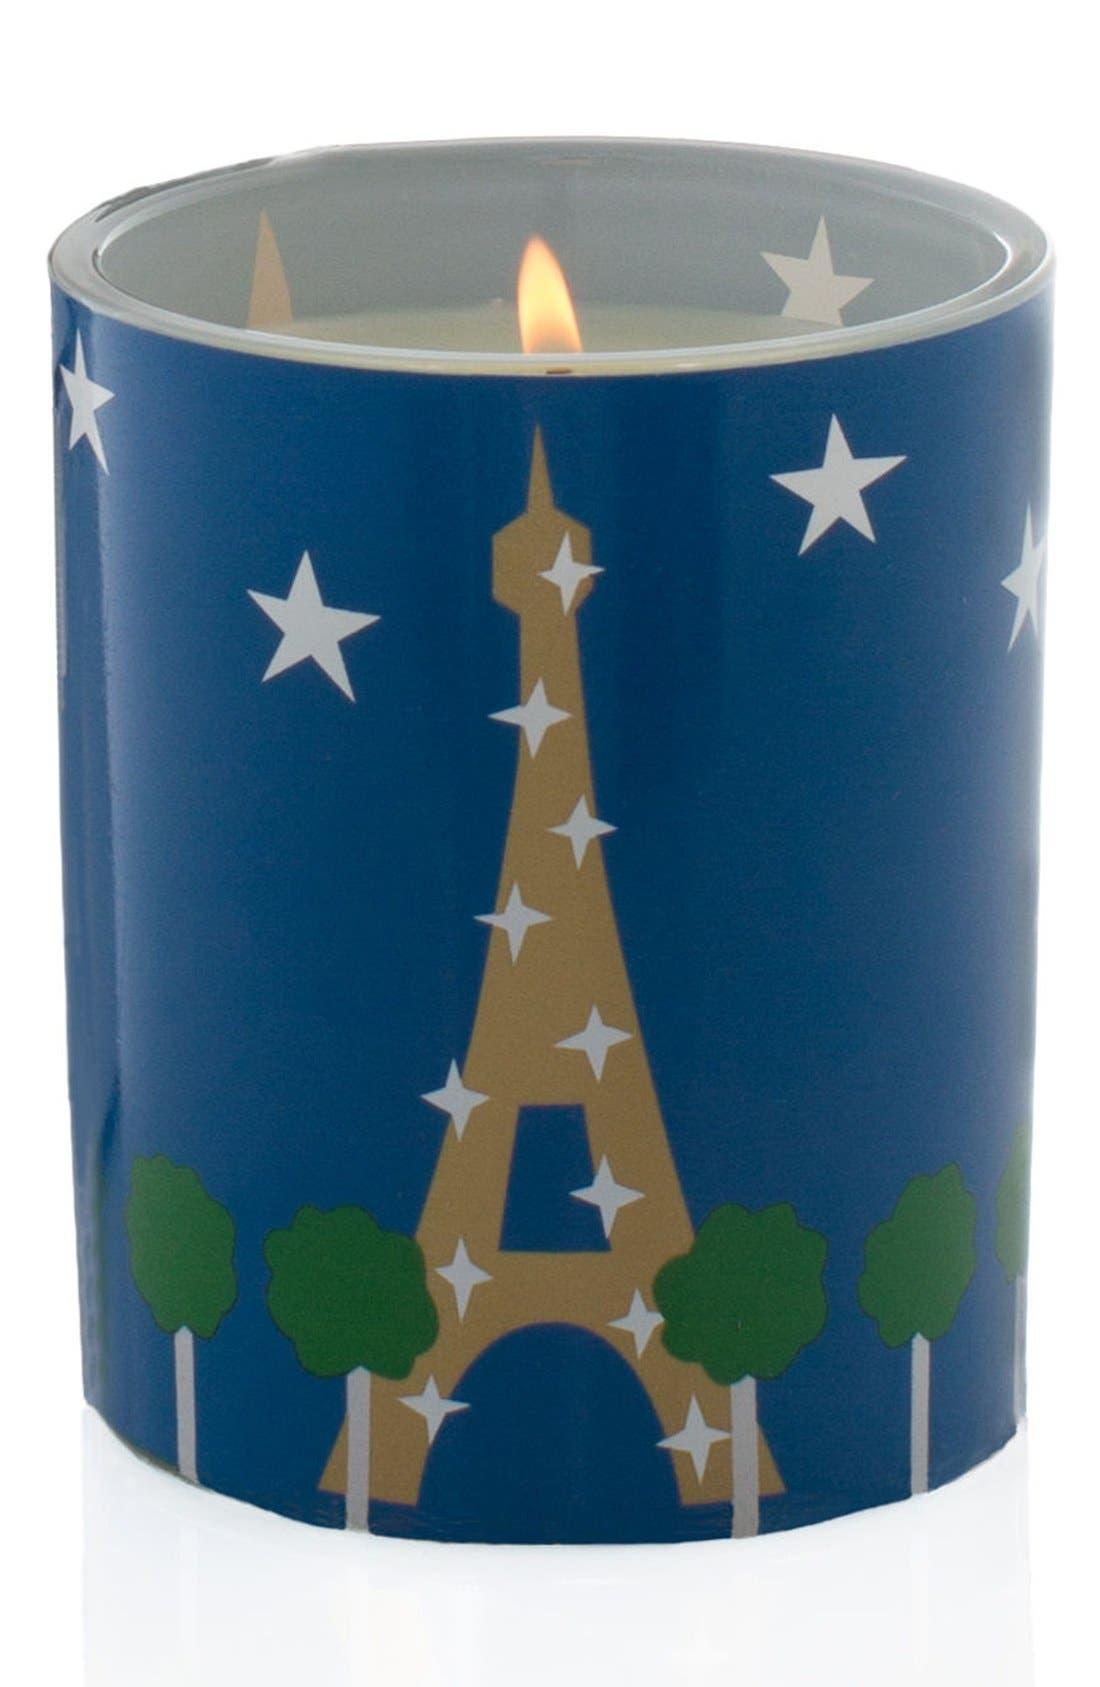 R. Nichols 'Paris' Scented Candle